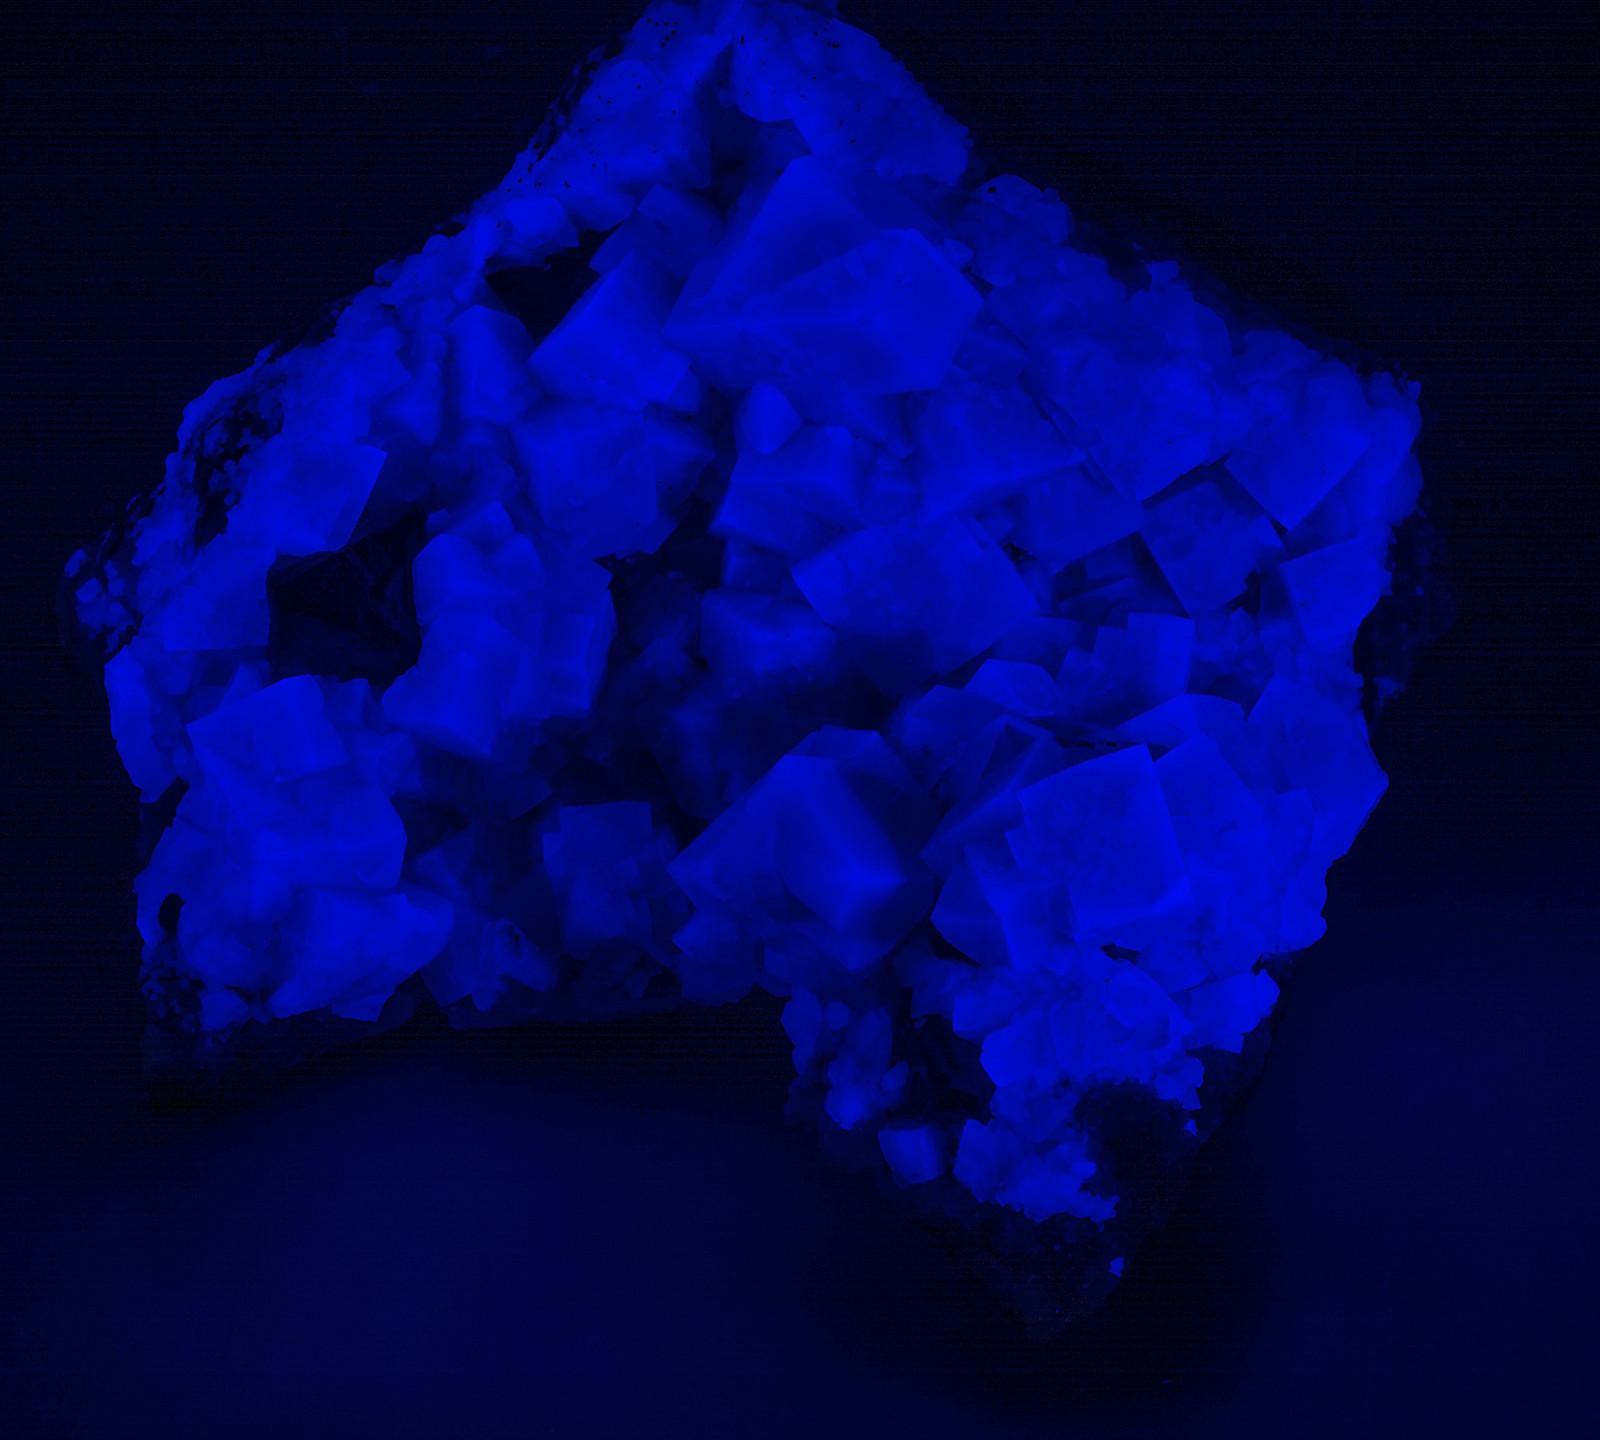 Rogerly Fluorite - SHORTWAVE